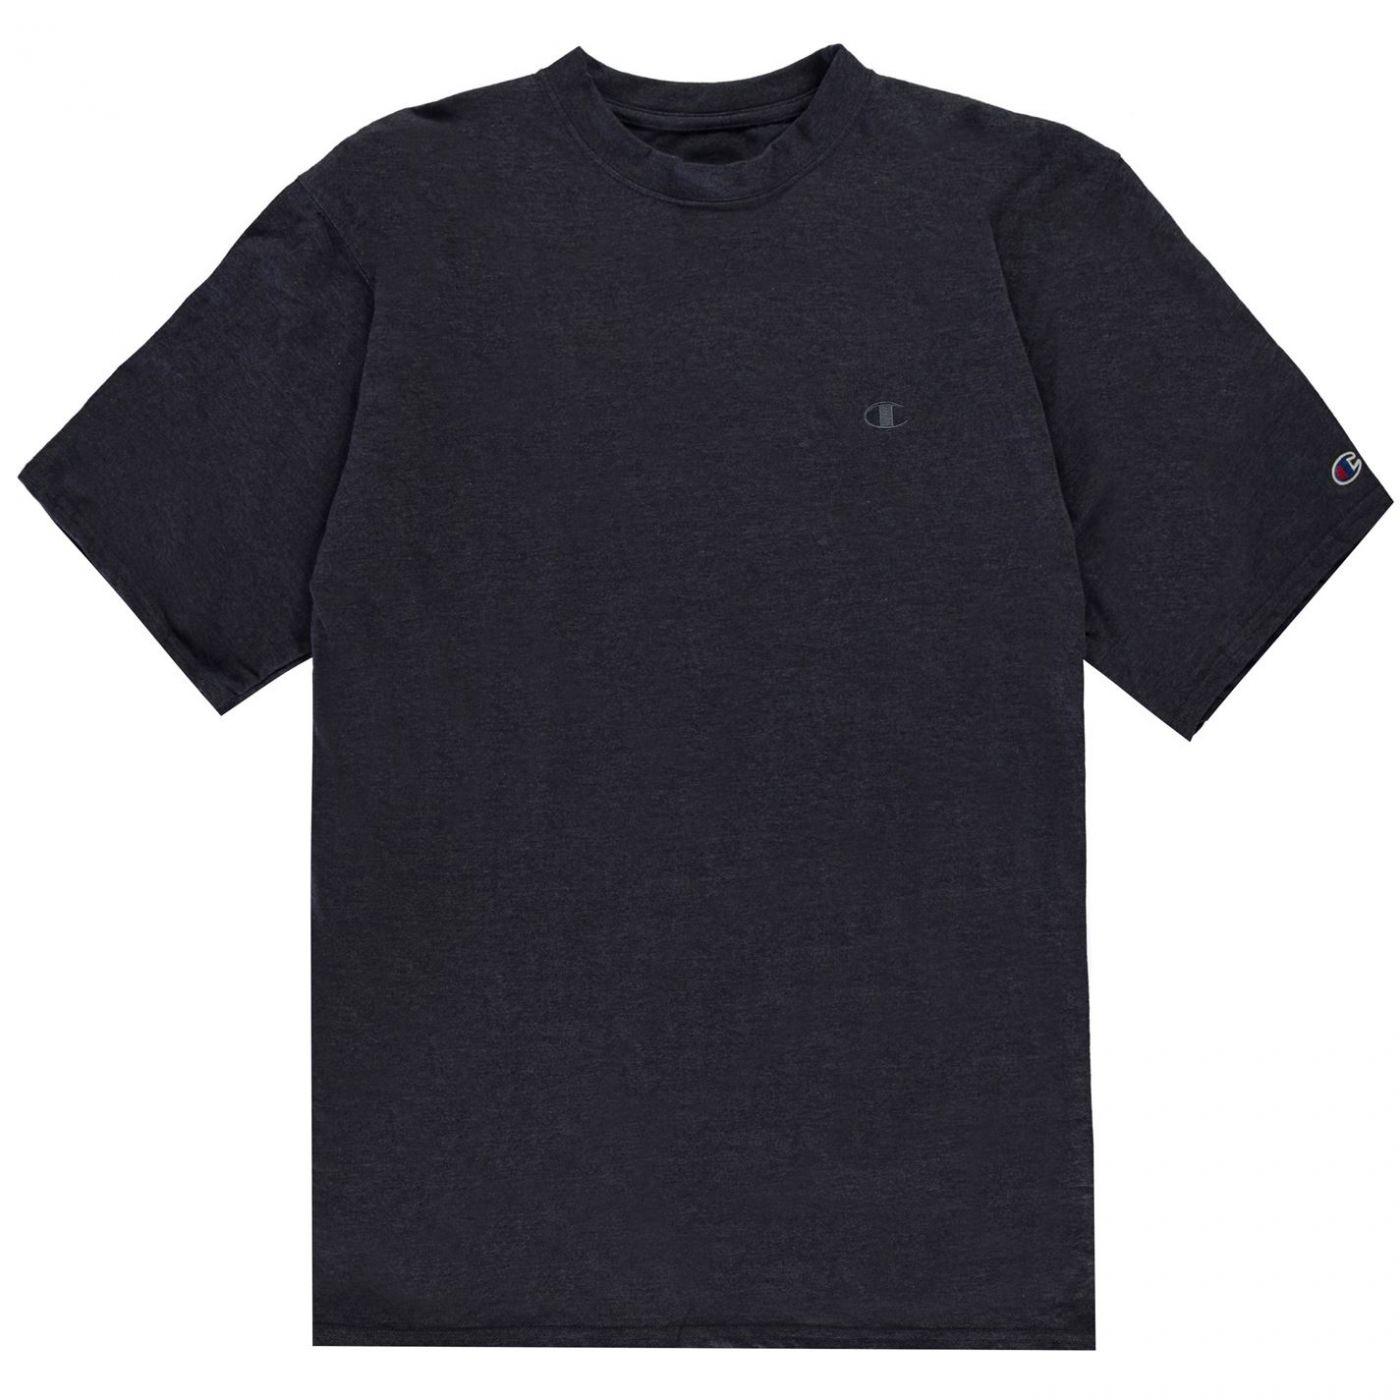 Champion Jersey Short Sleeve T Shirt